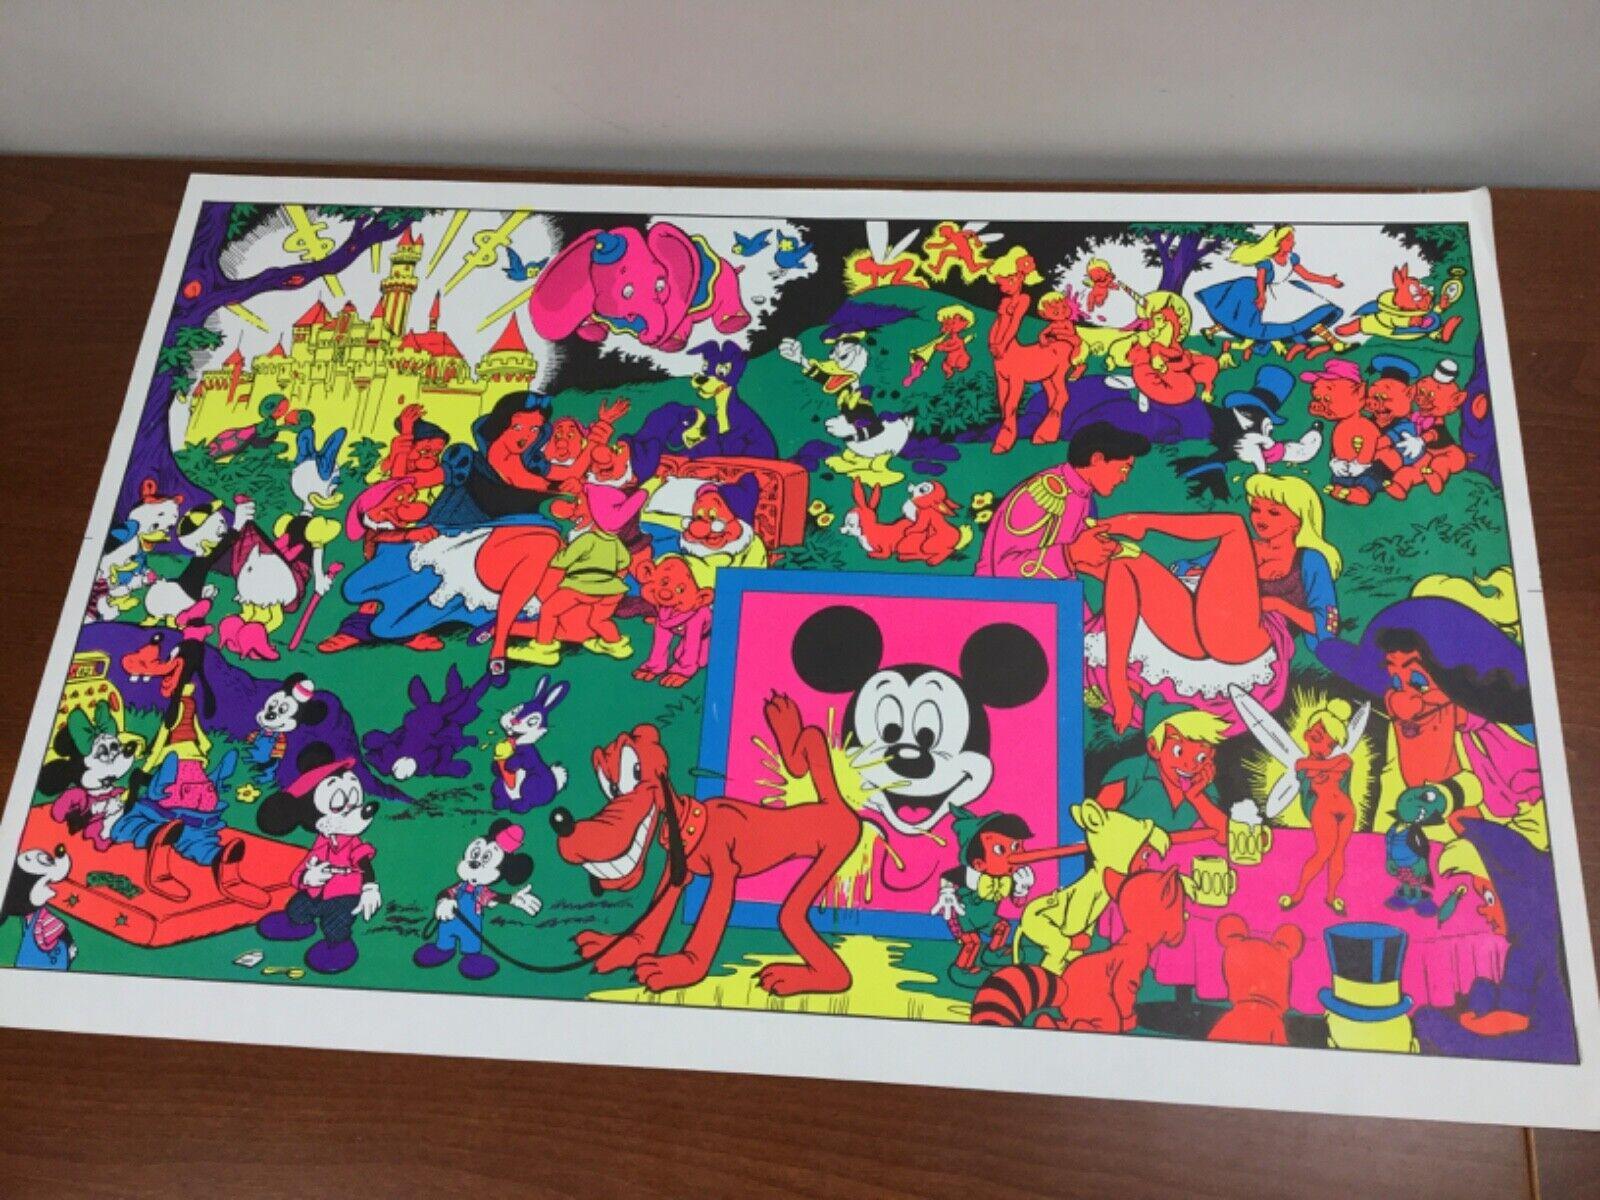 Vintage Black Light Poster Disney Wally Wood Design Orgy Sex Drugs Psychedelic - $148.00